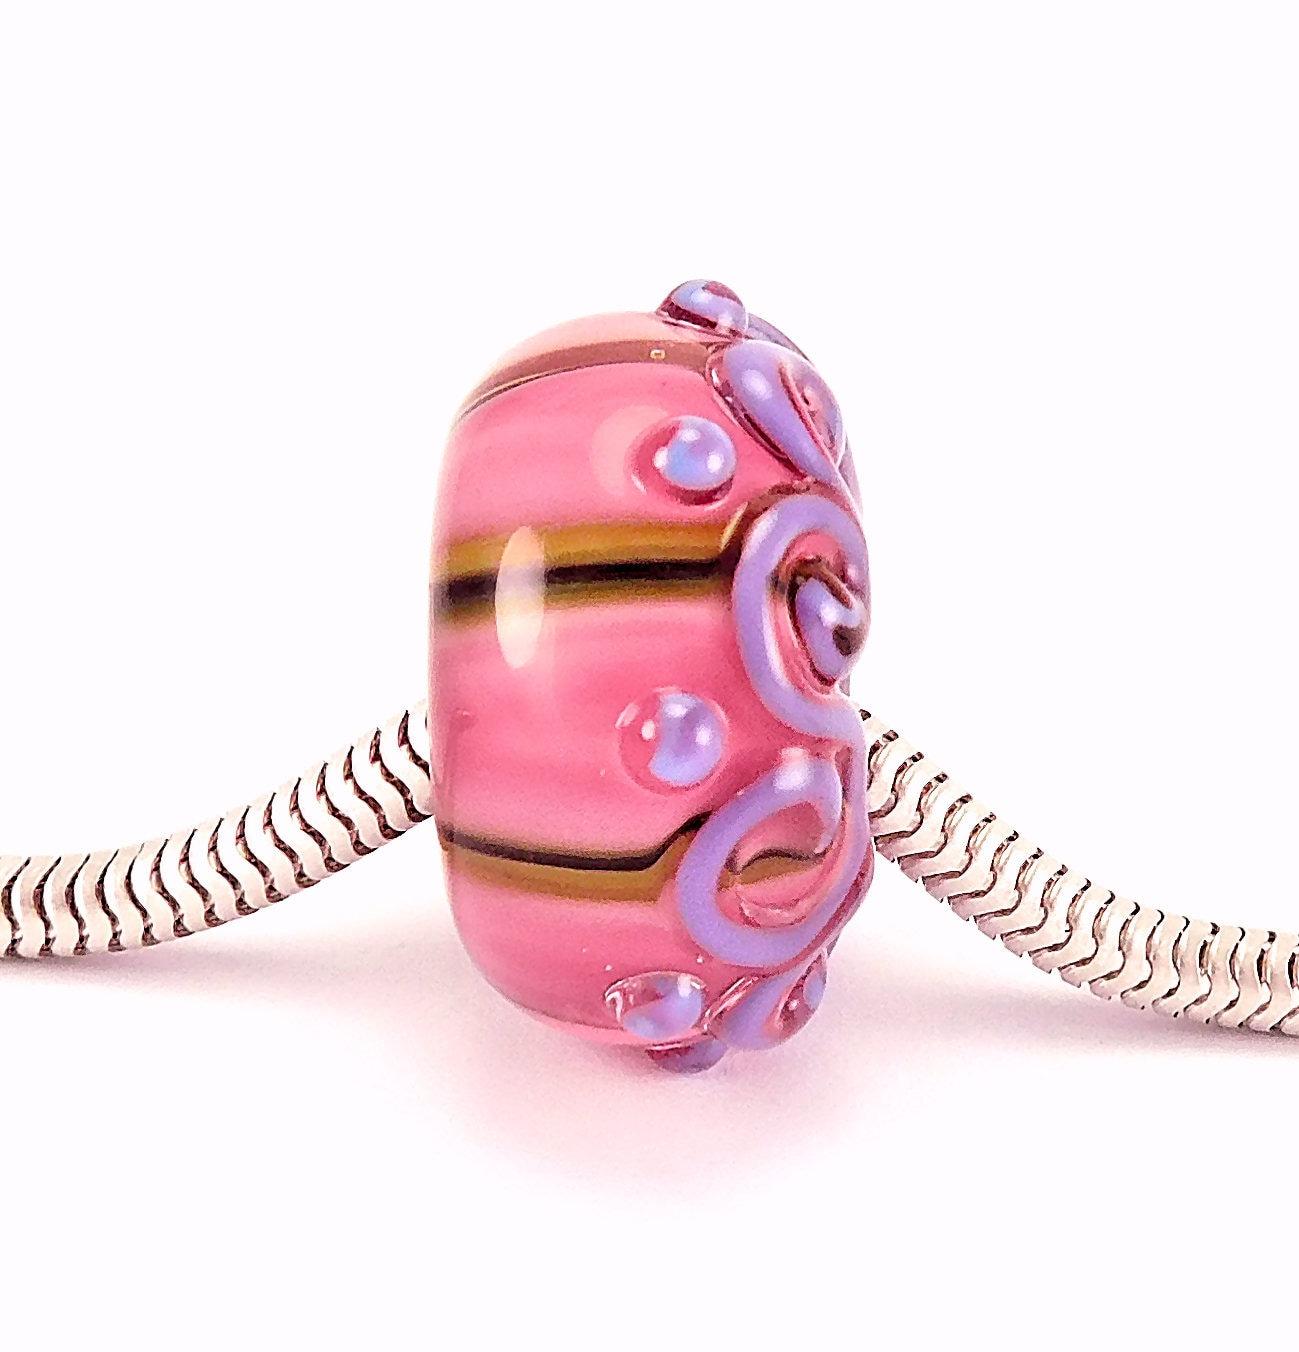 Handmade Lampwork European Charm Bracelet Barrel Shaped Bead with Sterling Silver Rivets large hole bead BD305 big hole bead OOAK